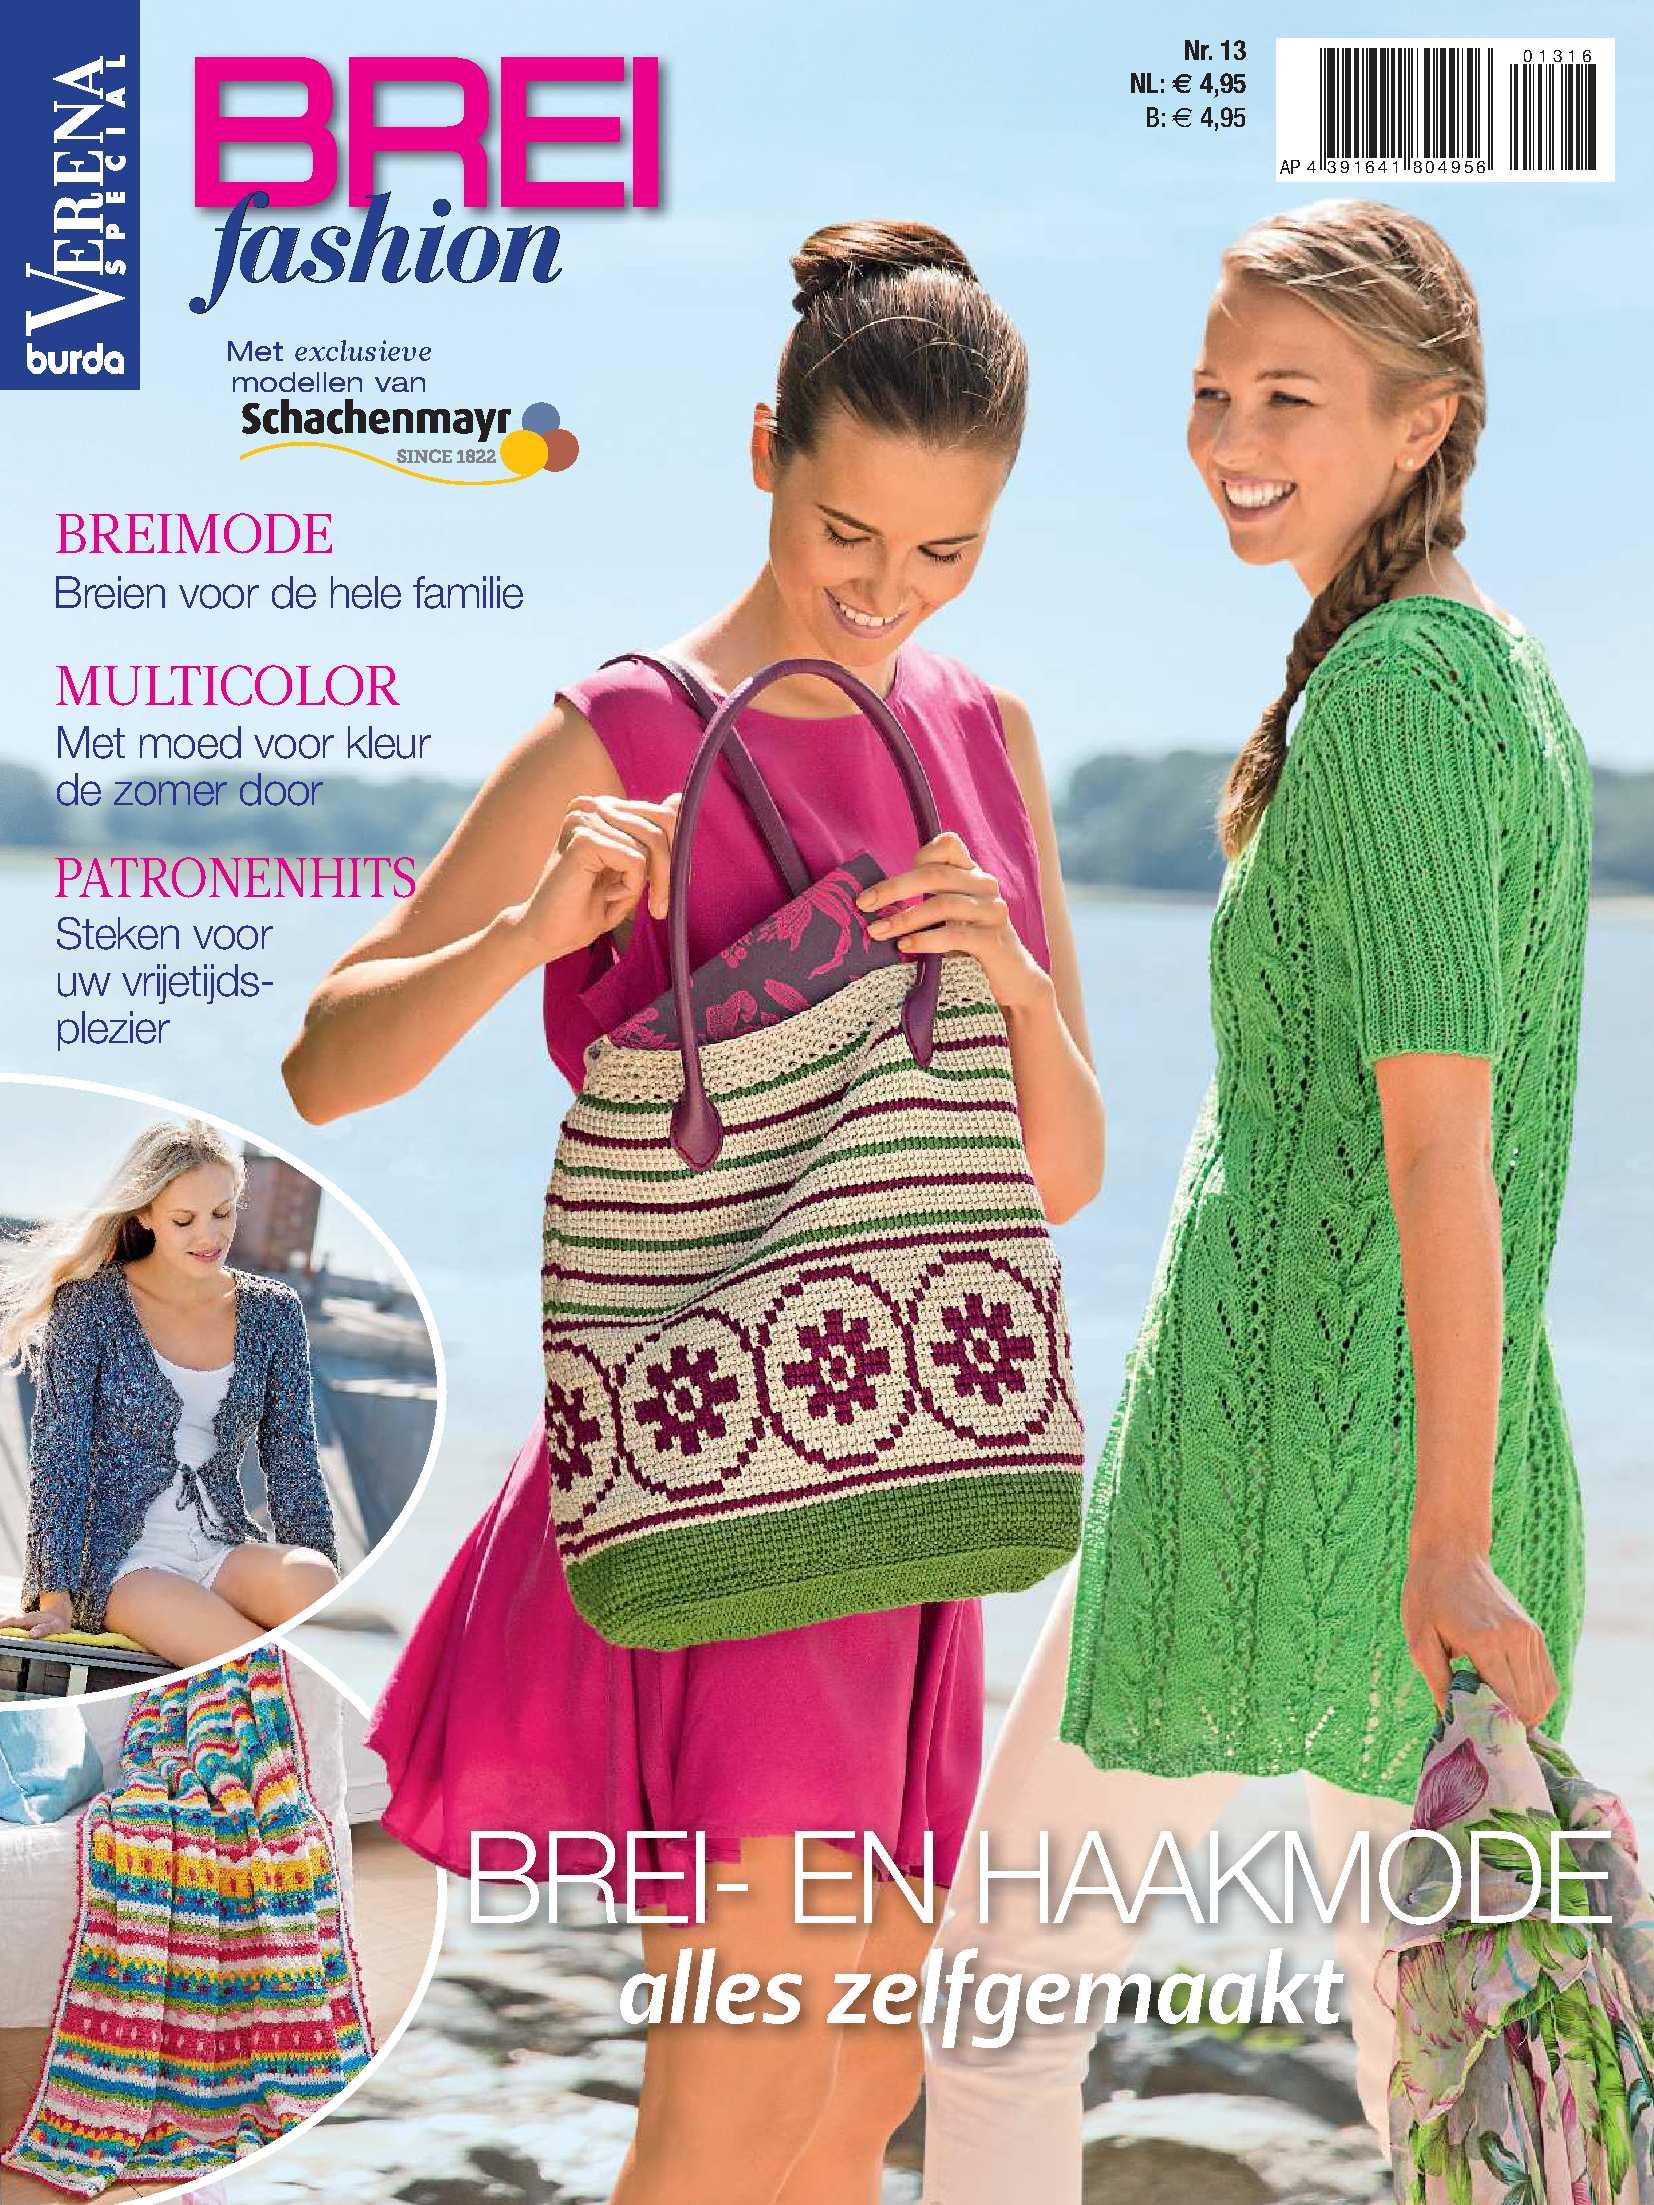 Verena Special Brei Fashion nr. 13